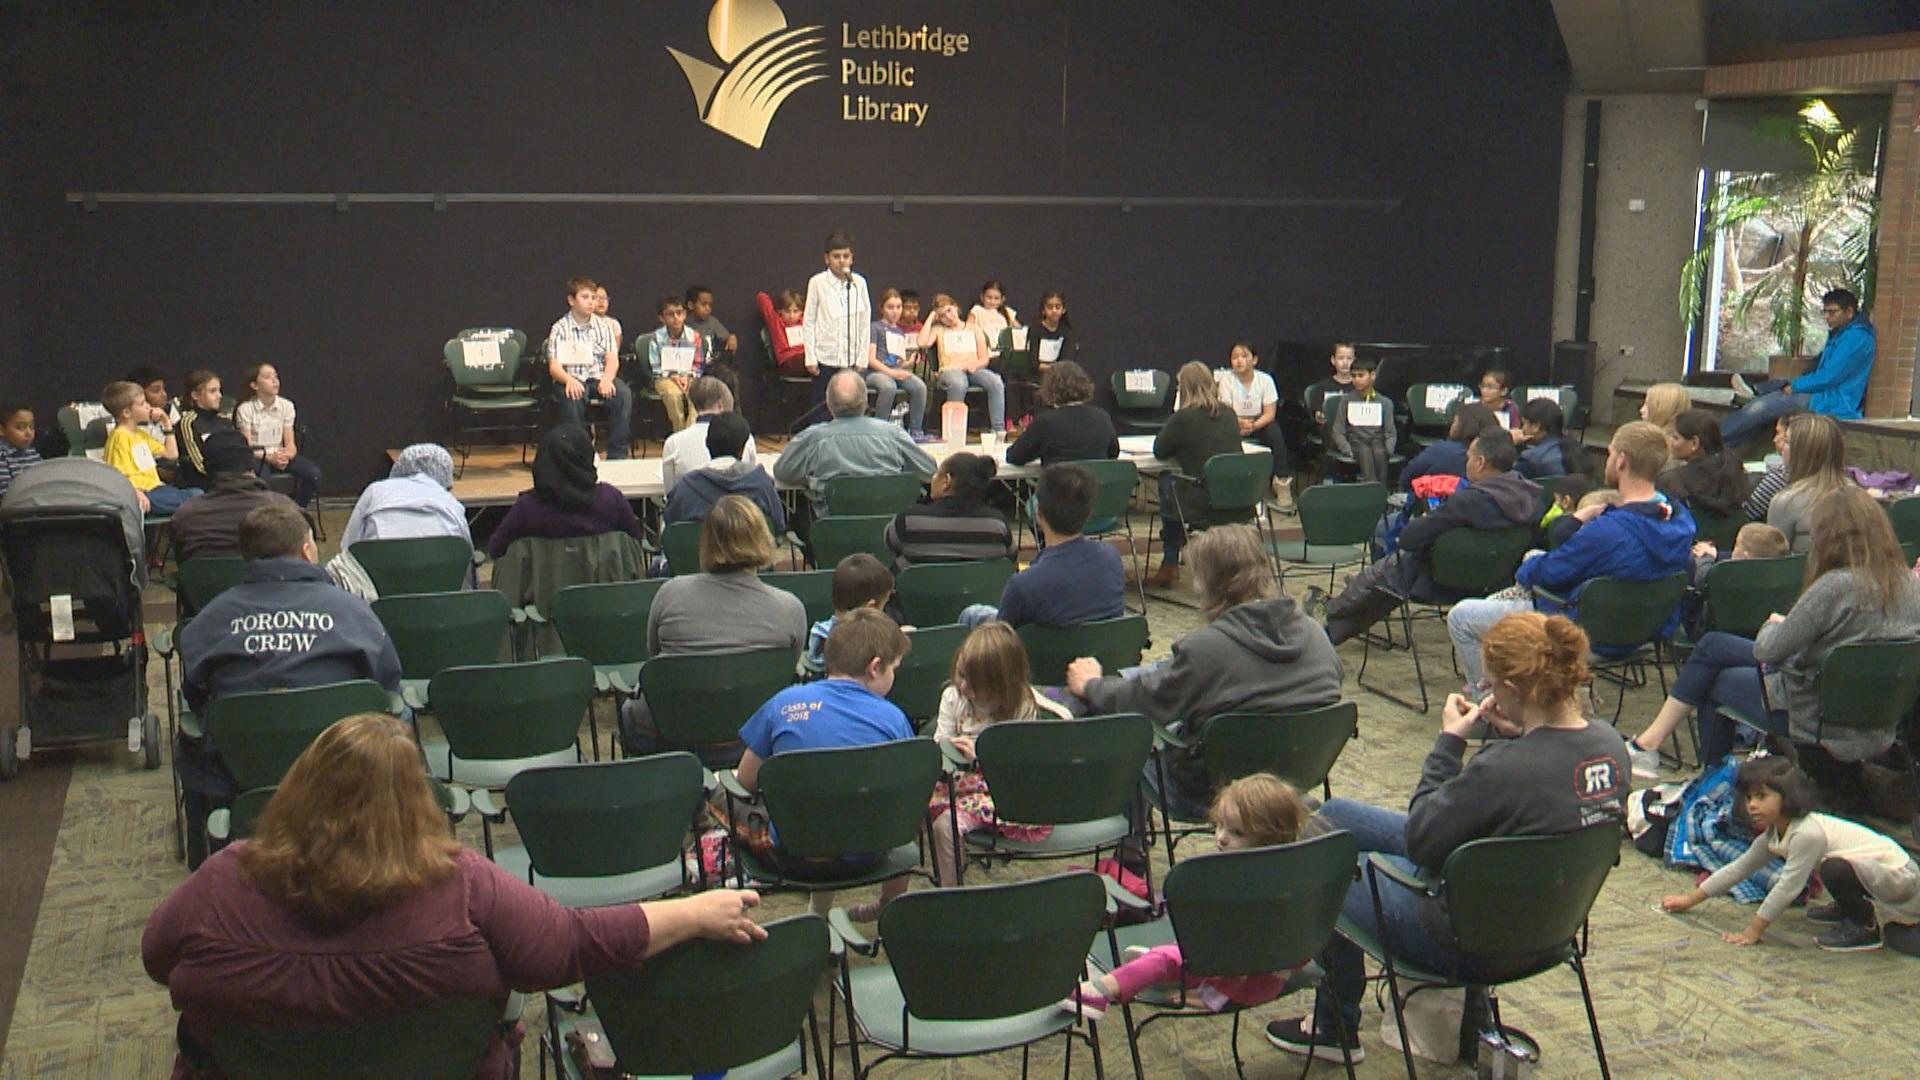 Lethbridge spelling bee promotes child literacy